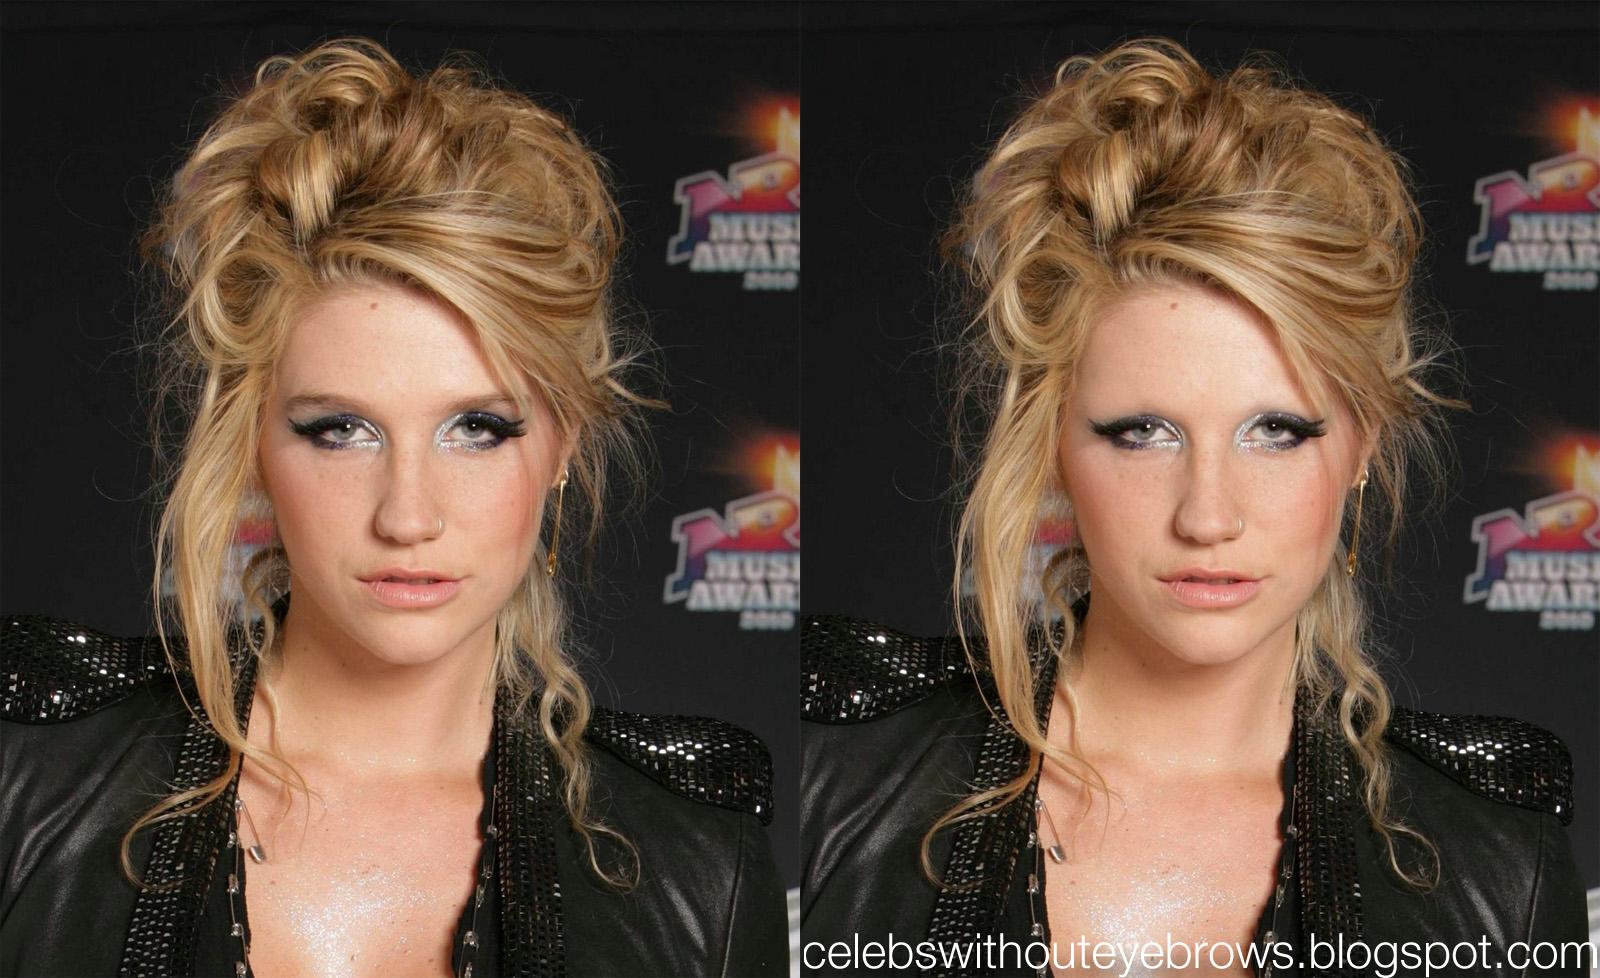 http://1.bp.blogspot.com/-DYJFtDIcE_A/T0KRhMYc4UI/AAAAAAAAAM4/thlfeOJTARc/s1600/Kesha.jpg